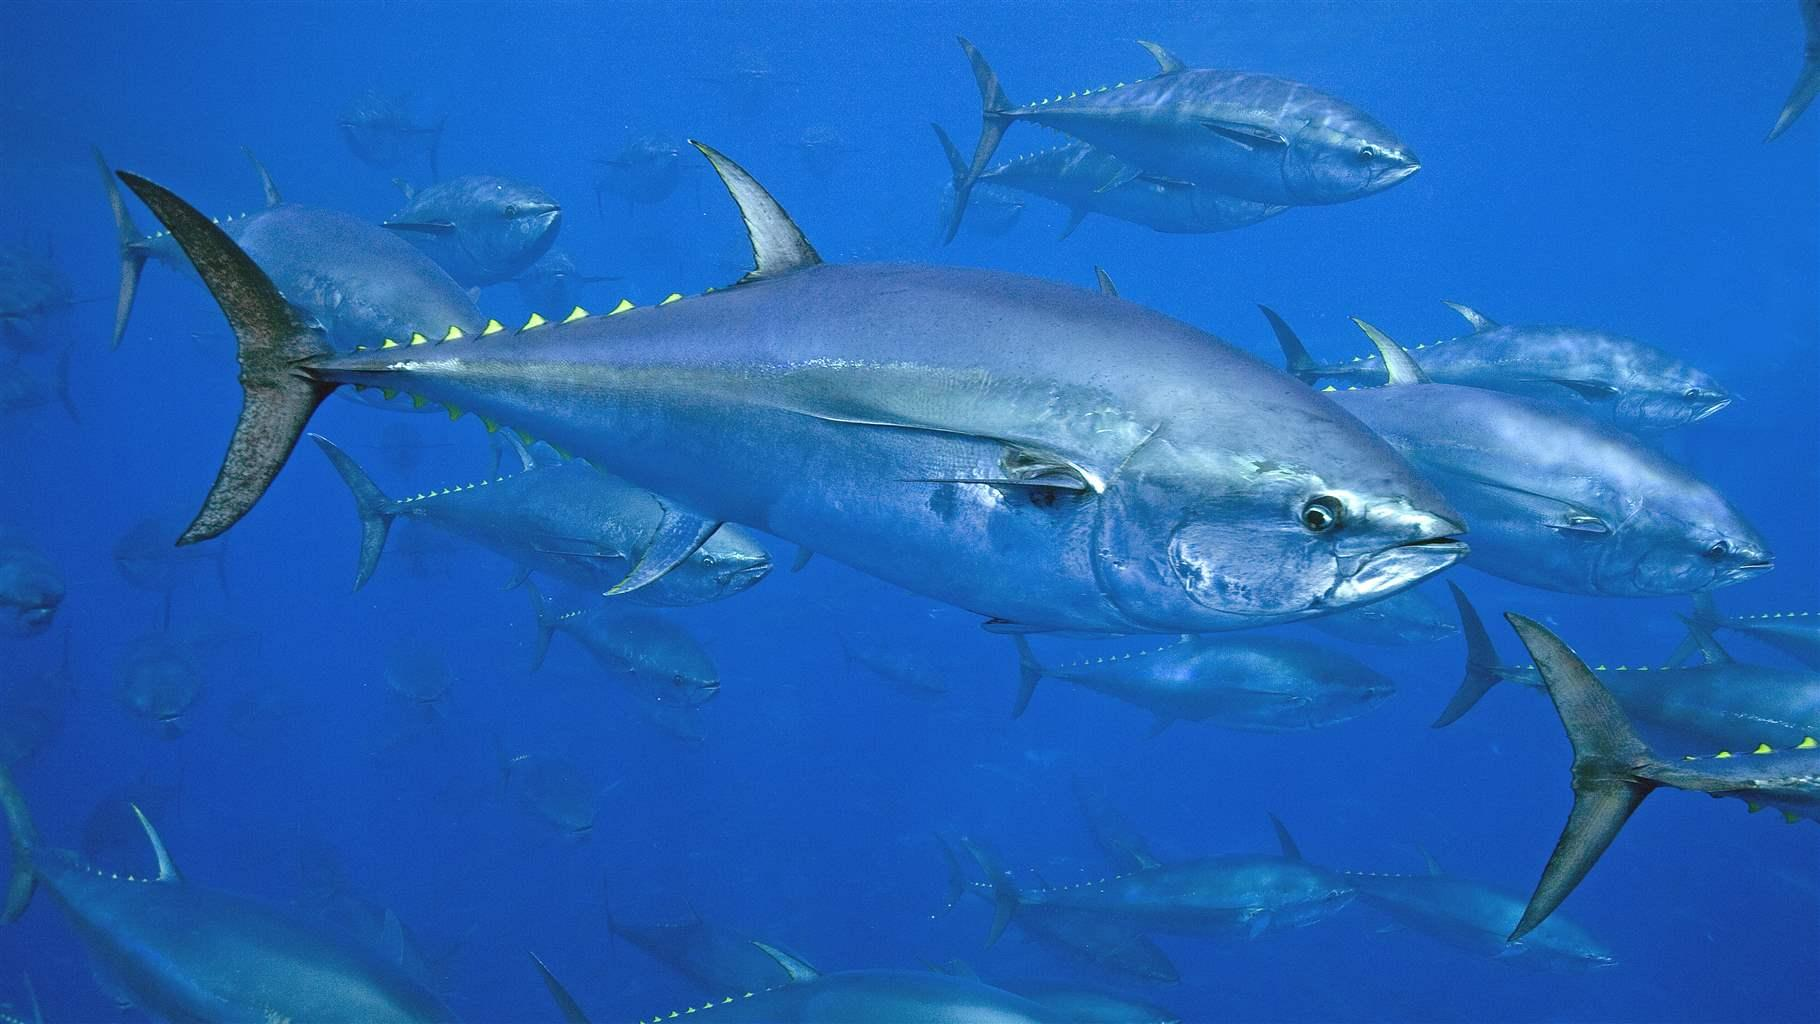 Tuňák zdroj omega marine forte